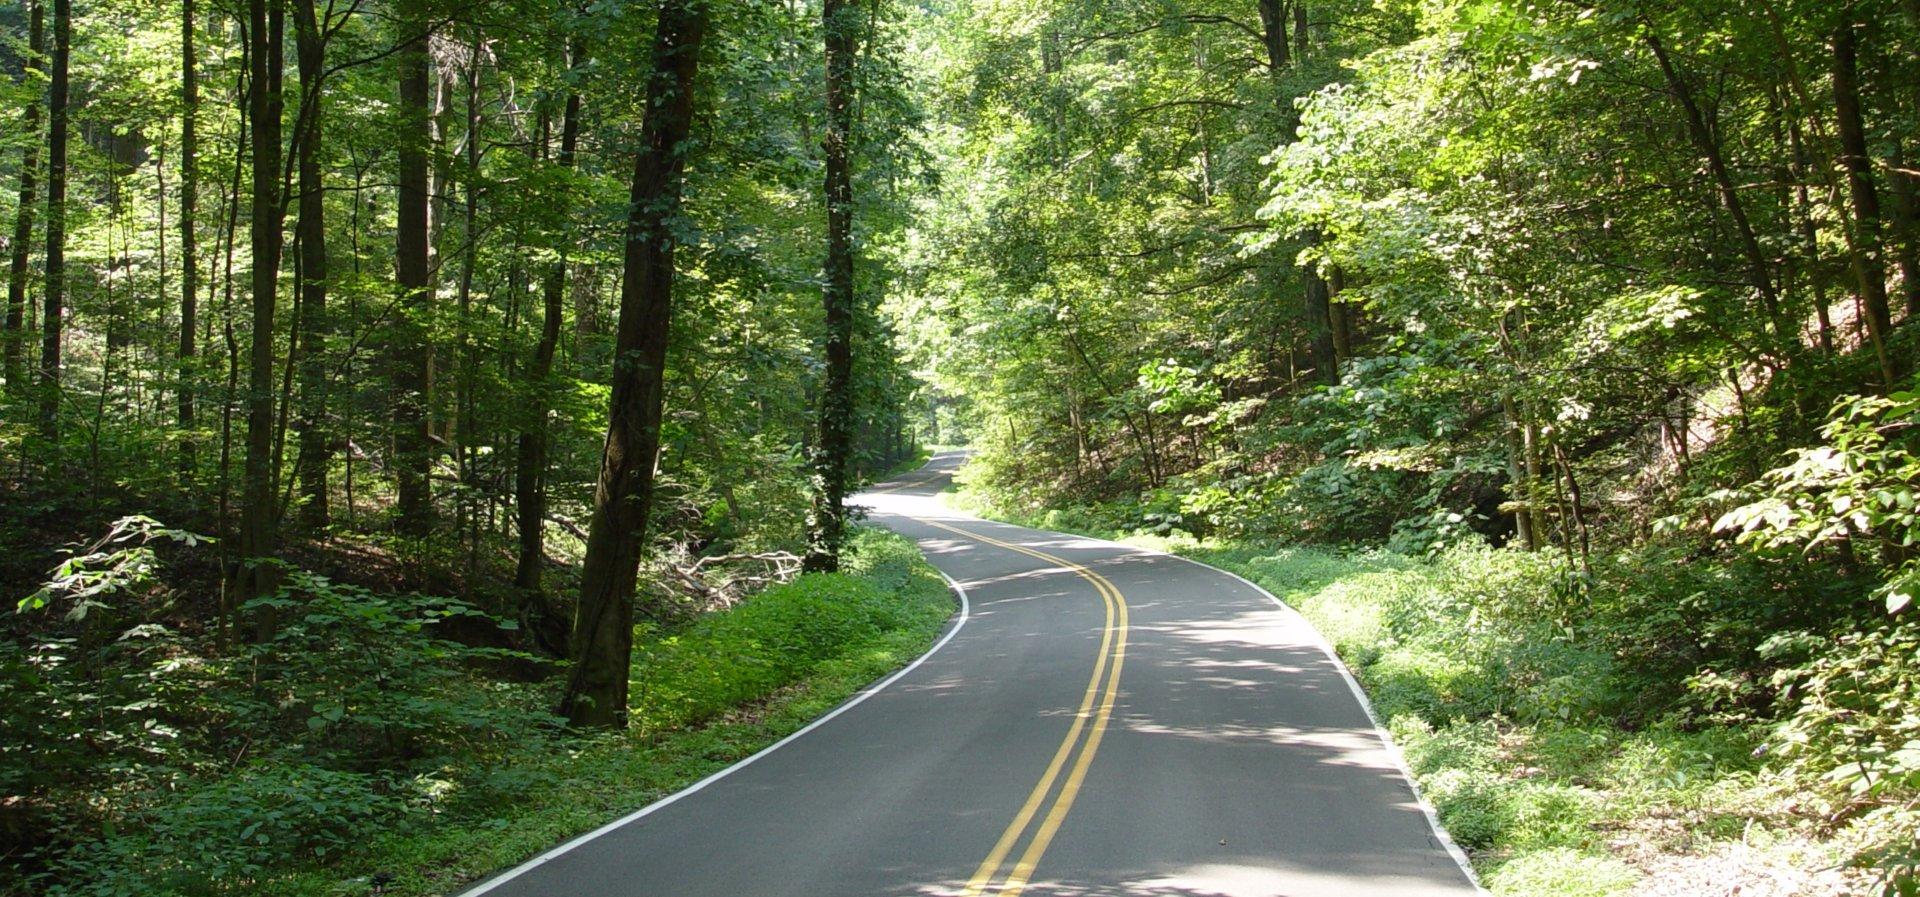 Jefferson Memorial Forest - Tree Lined Roadway